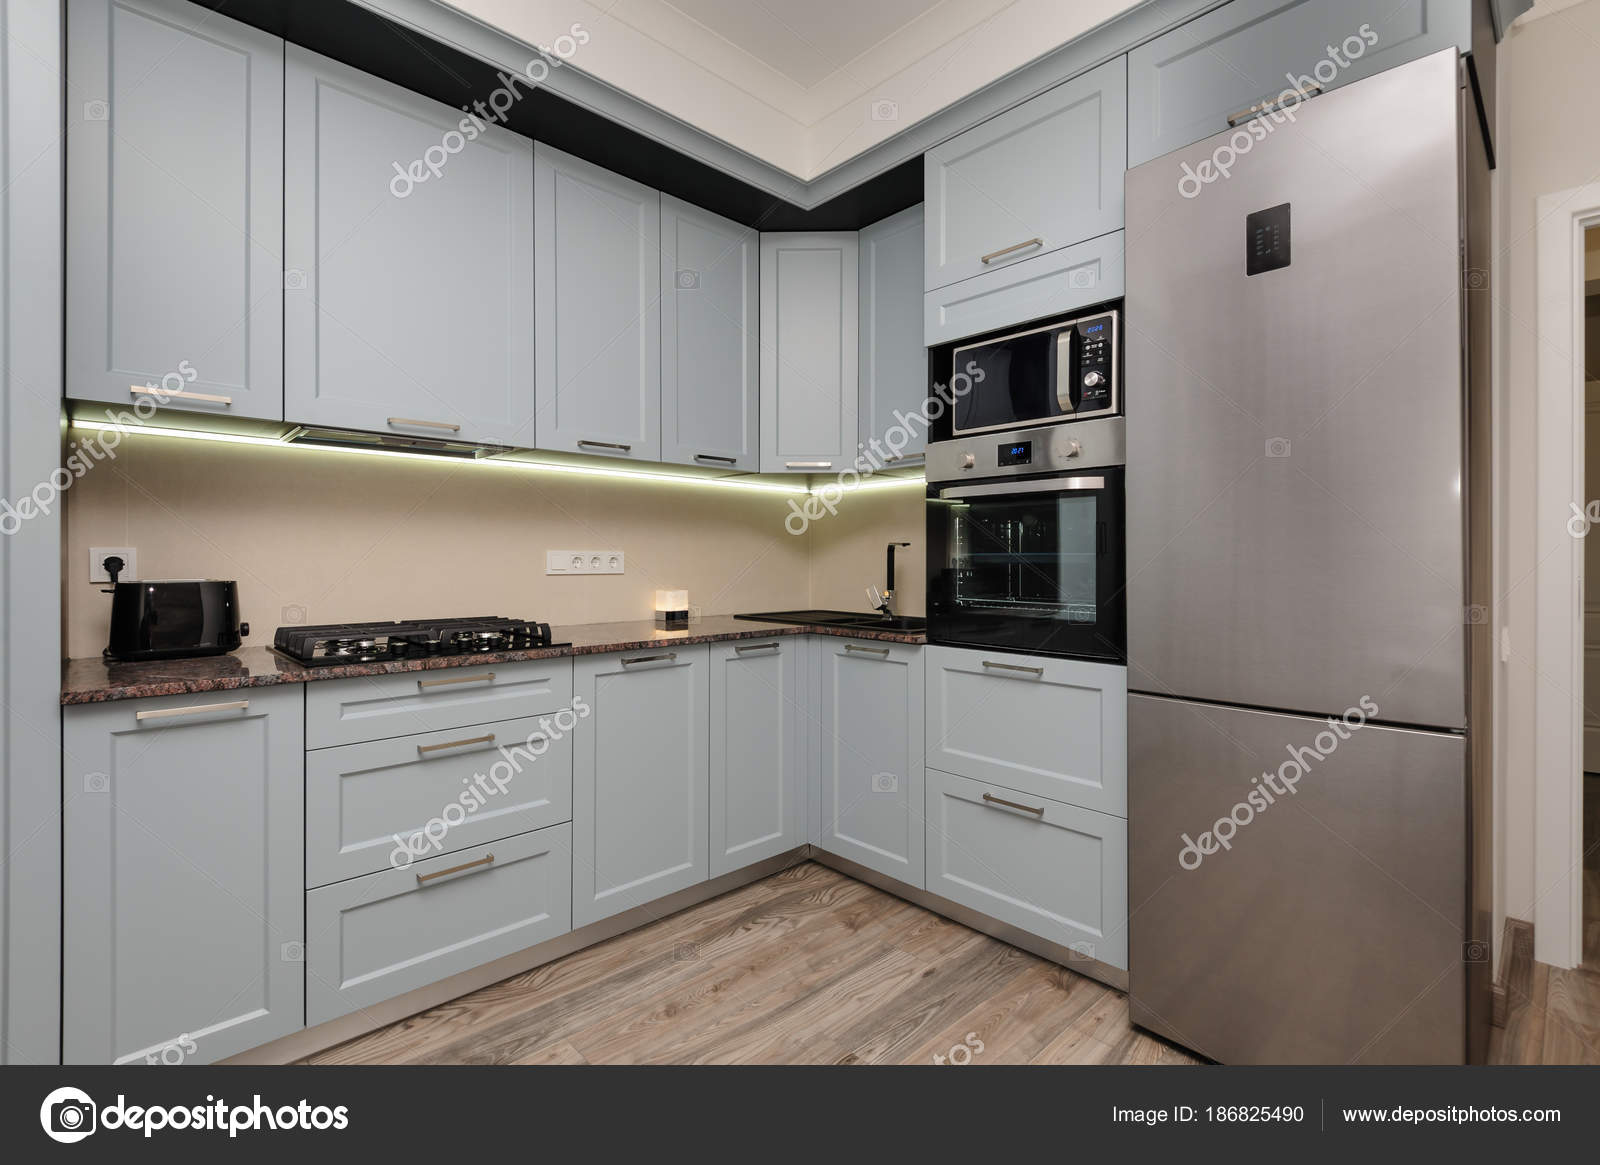 Moderne keuken interieur u2014 stockfoto © starush #186825490